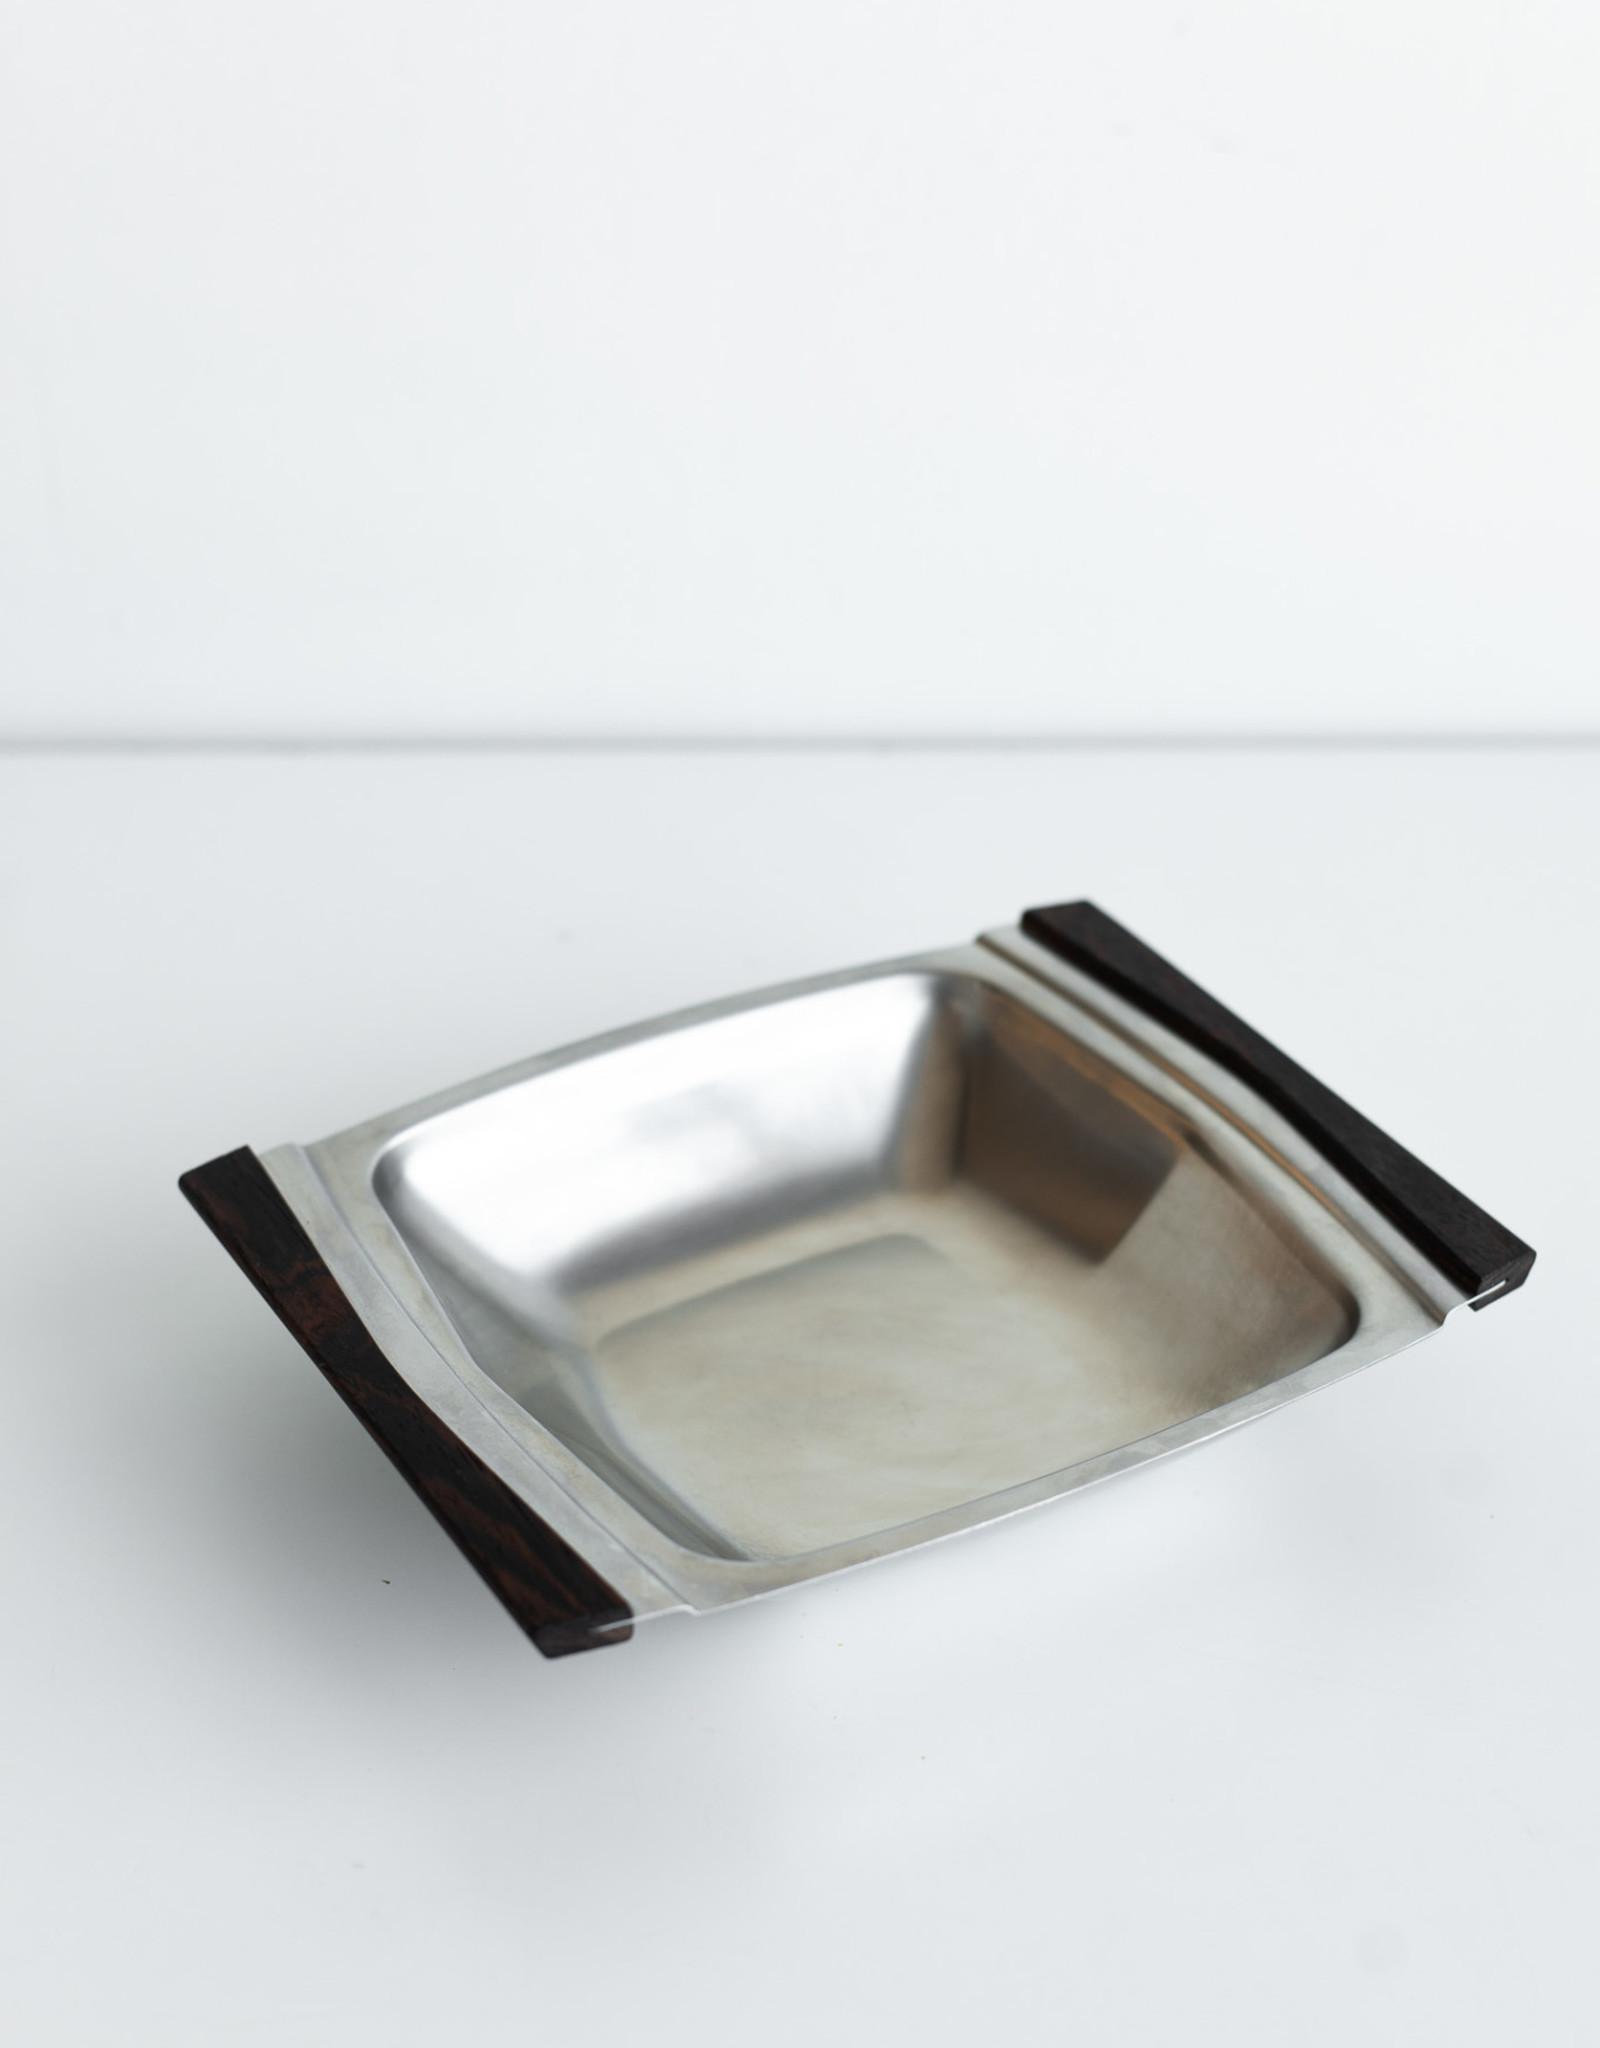 Autour de la Table Vide Poche en acier inoxydable